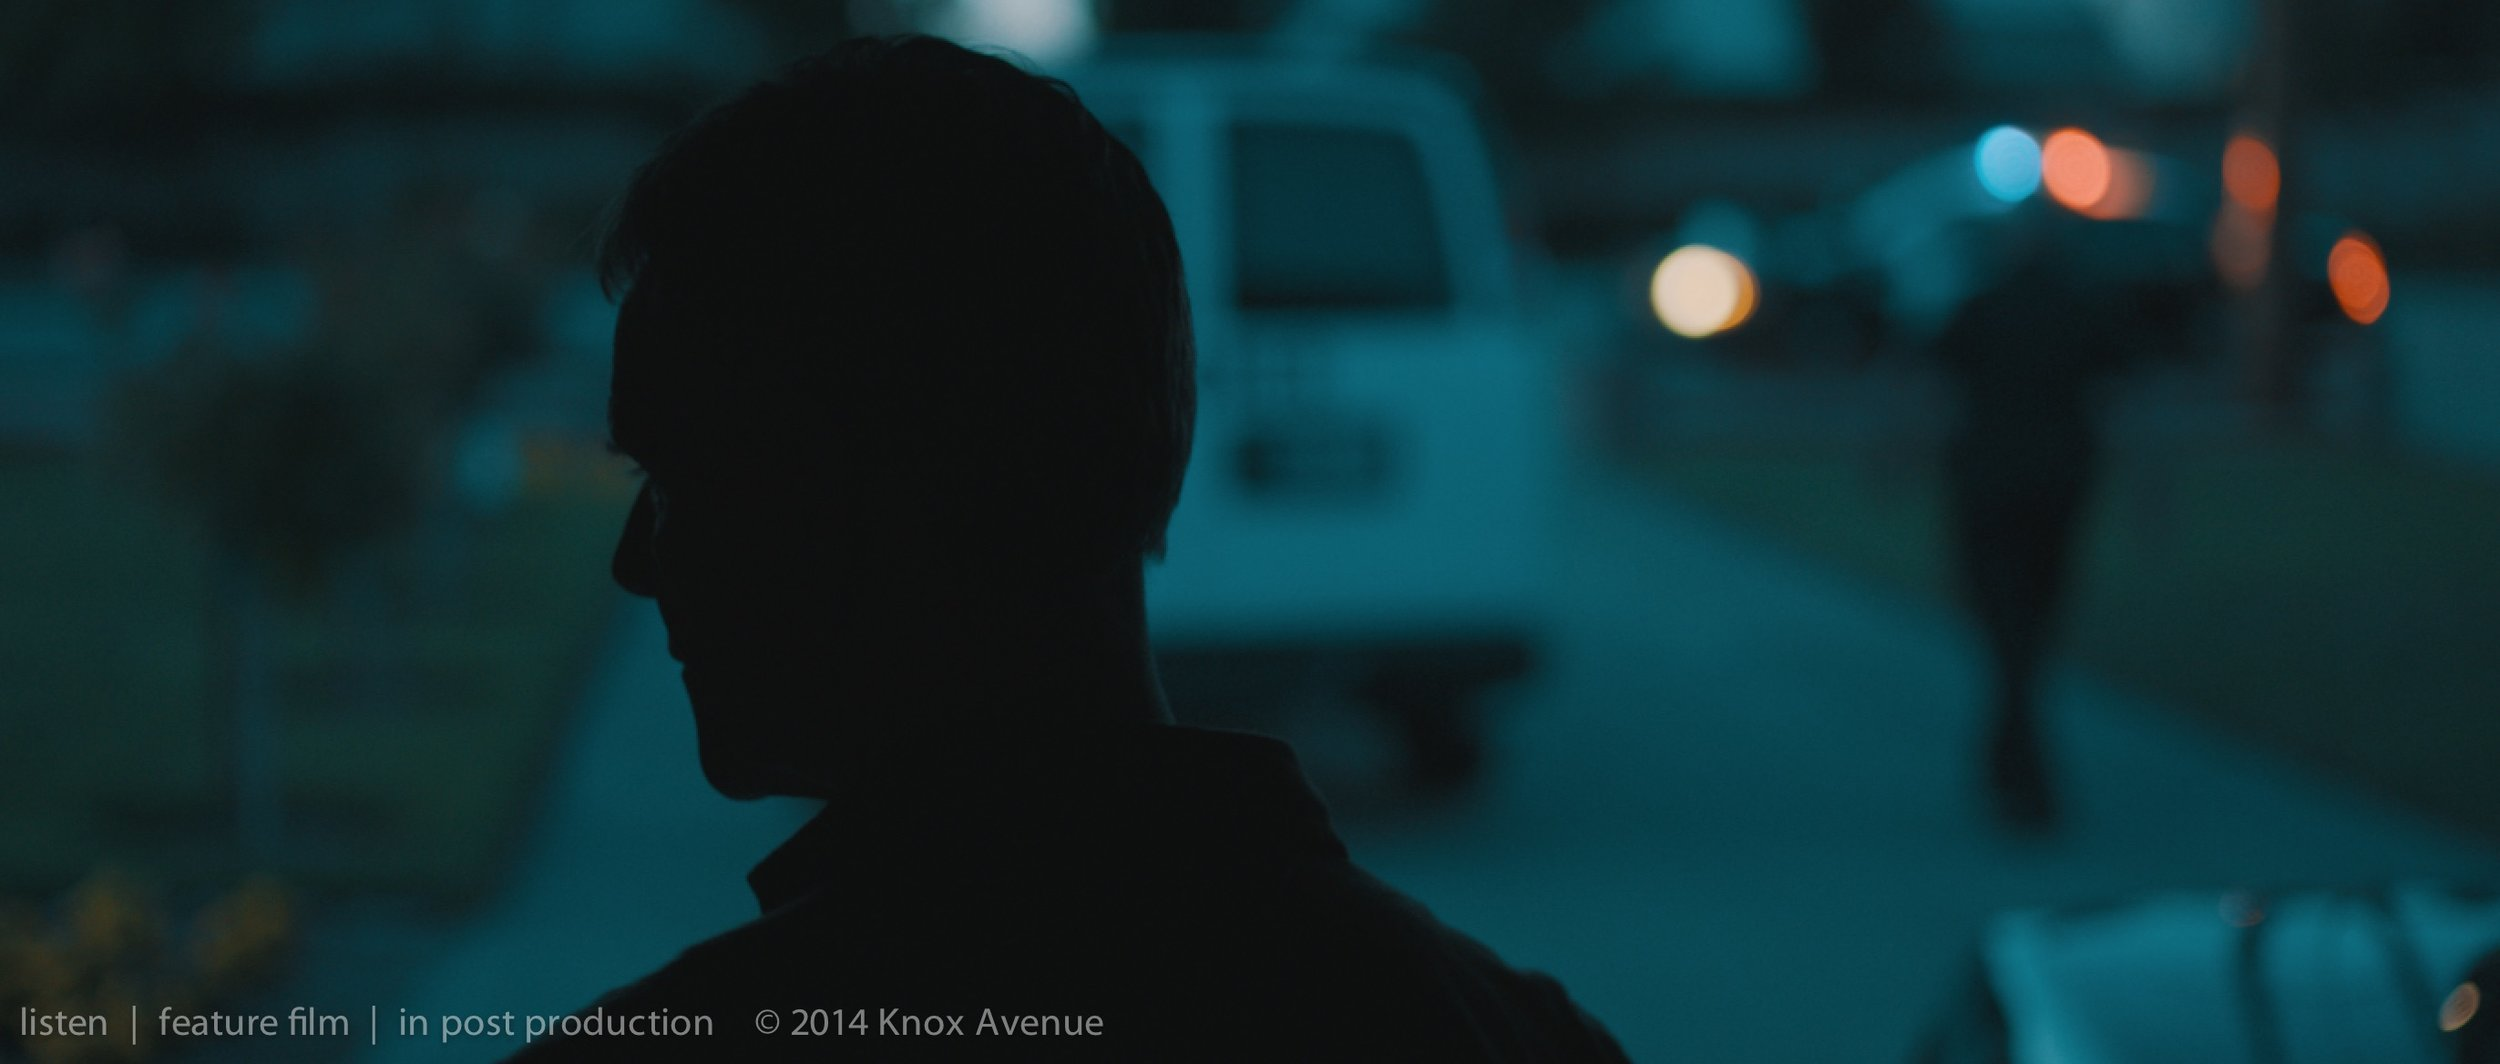 Screen Shot 2014-10-01 at 2.10.27 PM.jpg